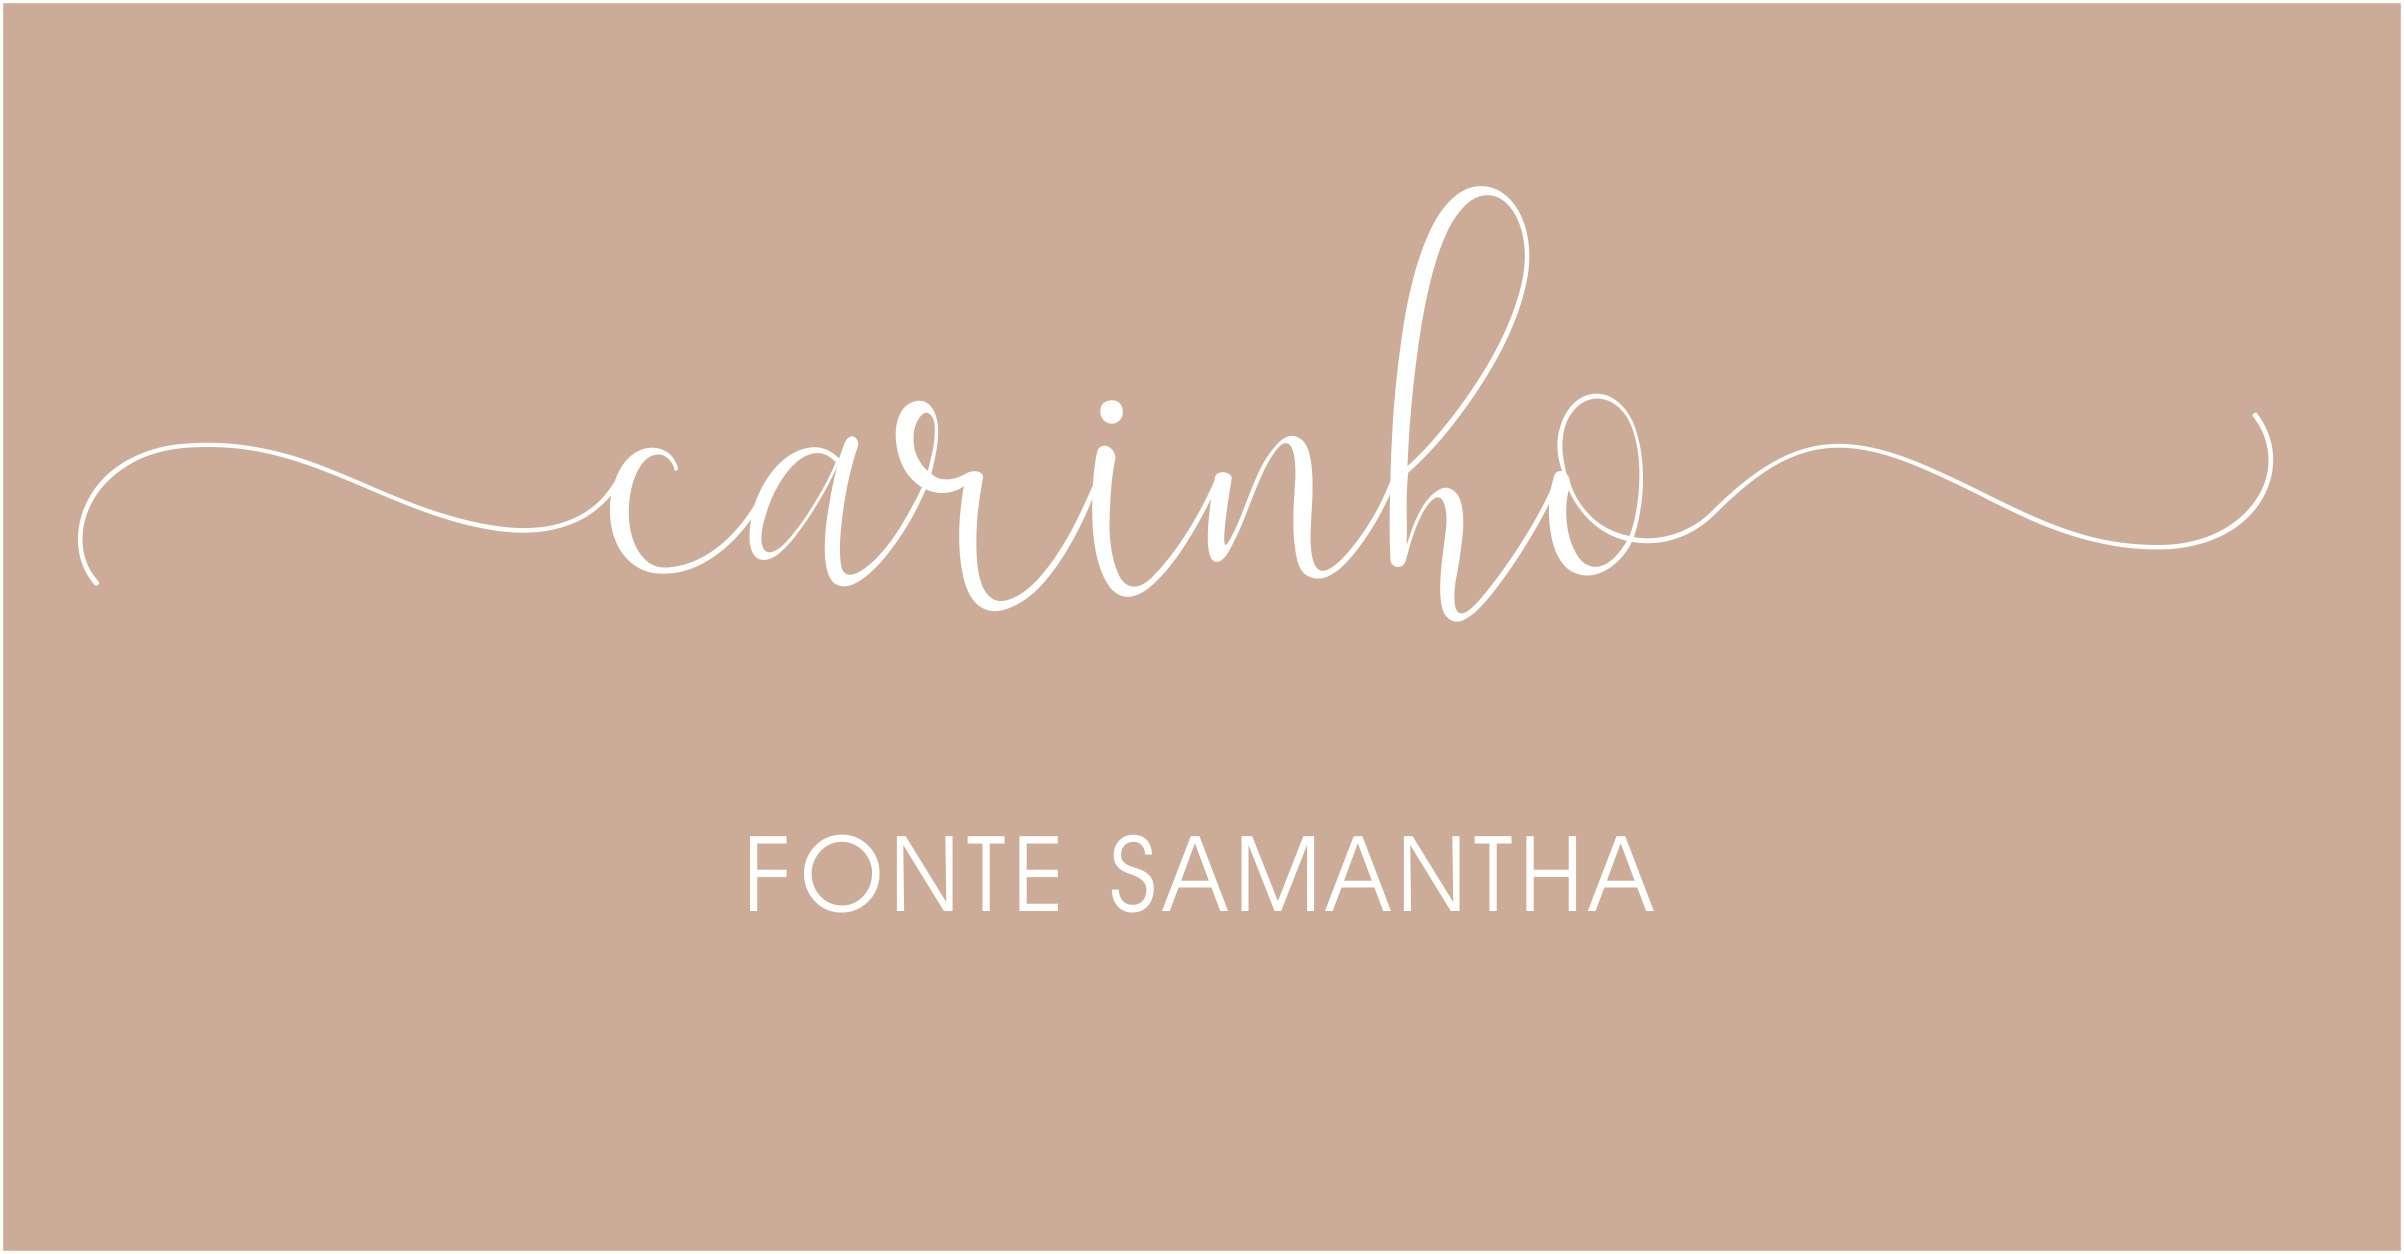 Letras com rabinhos para convites de casamento Samantha